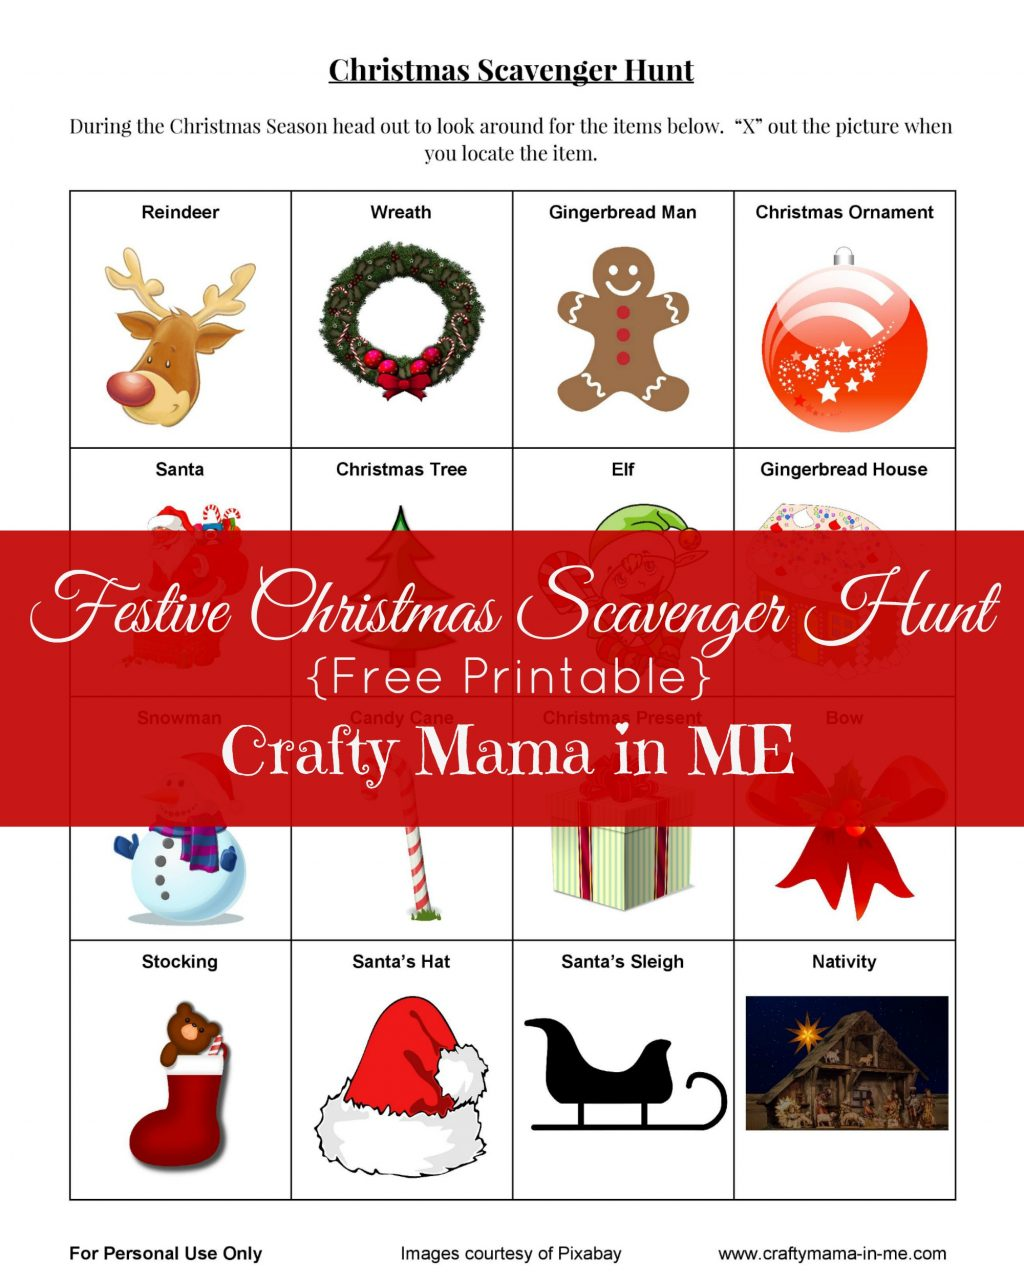 Festive Christmas Scavenger Hunt {Free Printable}